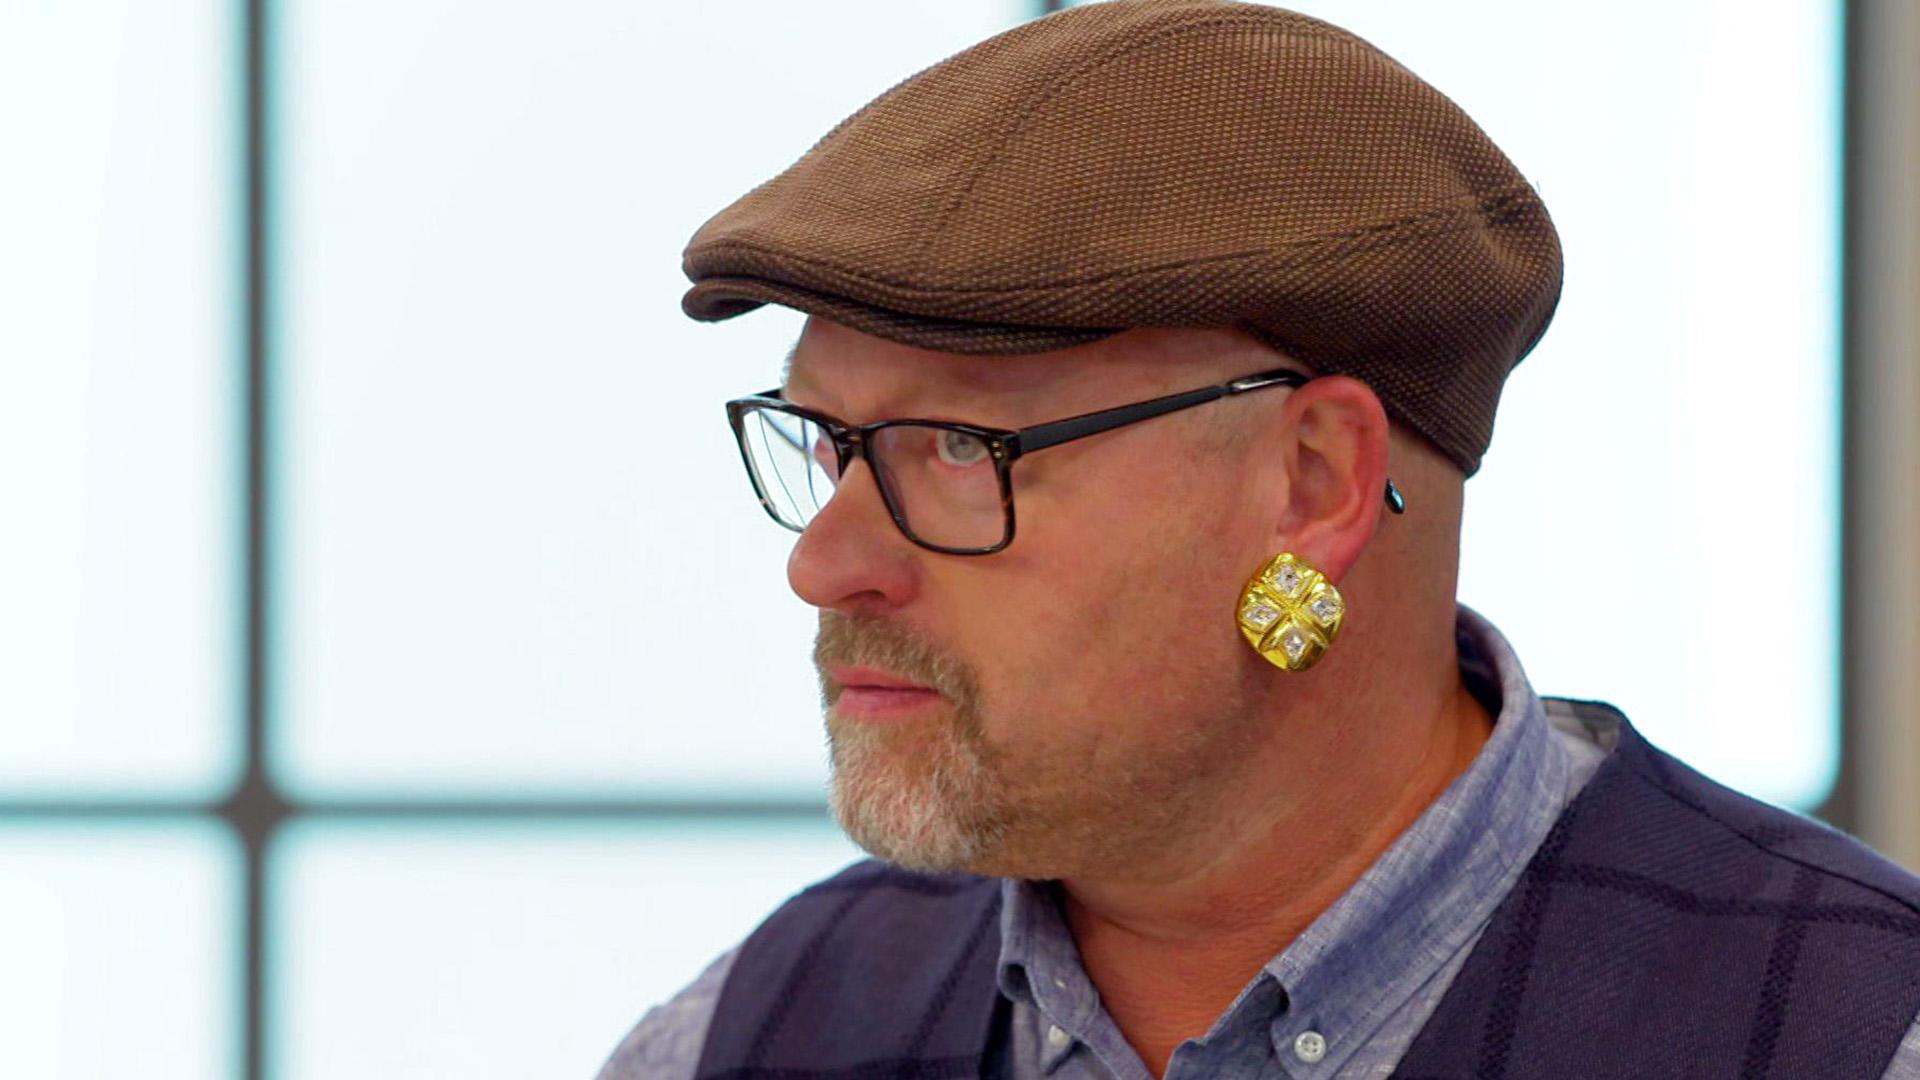 Chanel Ohrringe / Dollar Leiterplatte von Imbue | Folge 33